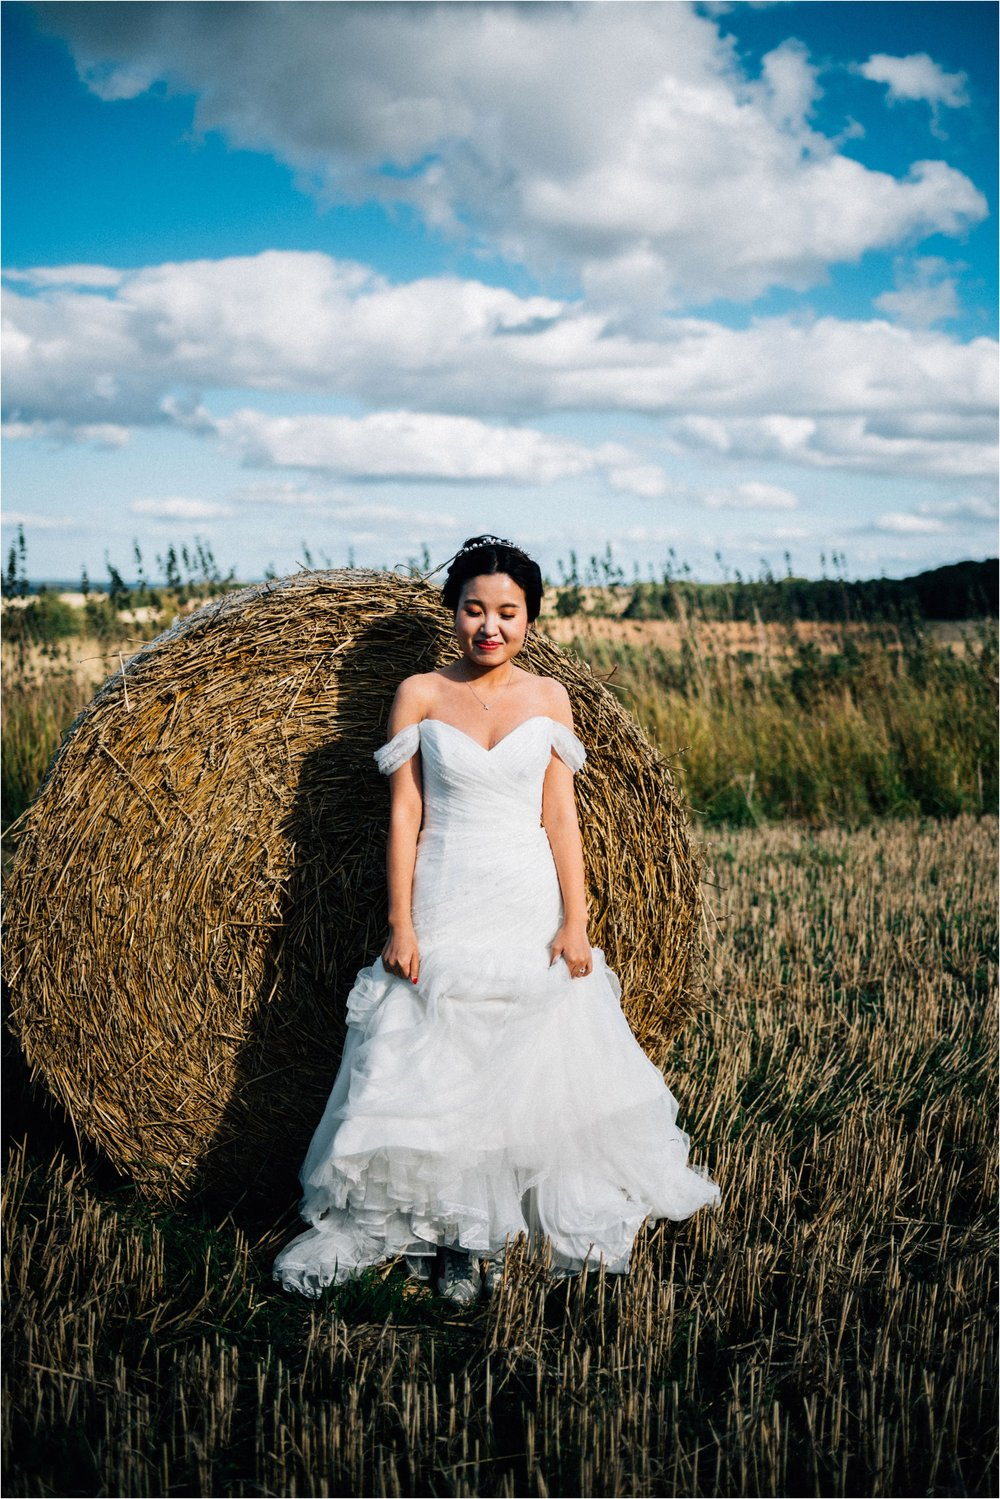 York city elopement wedding photographer_0199.jpg